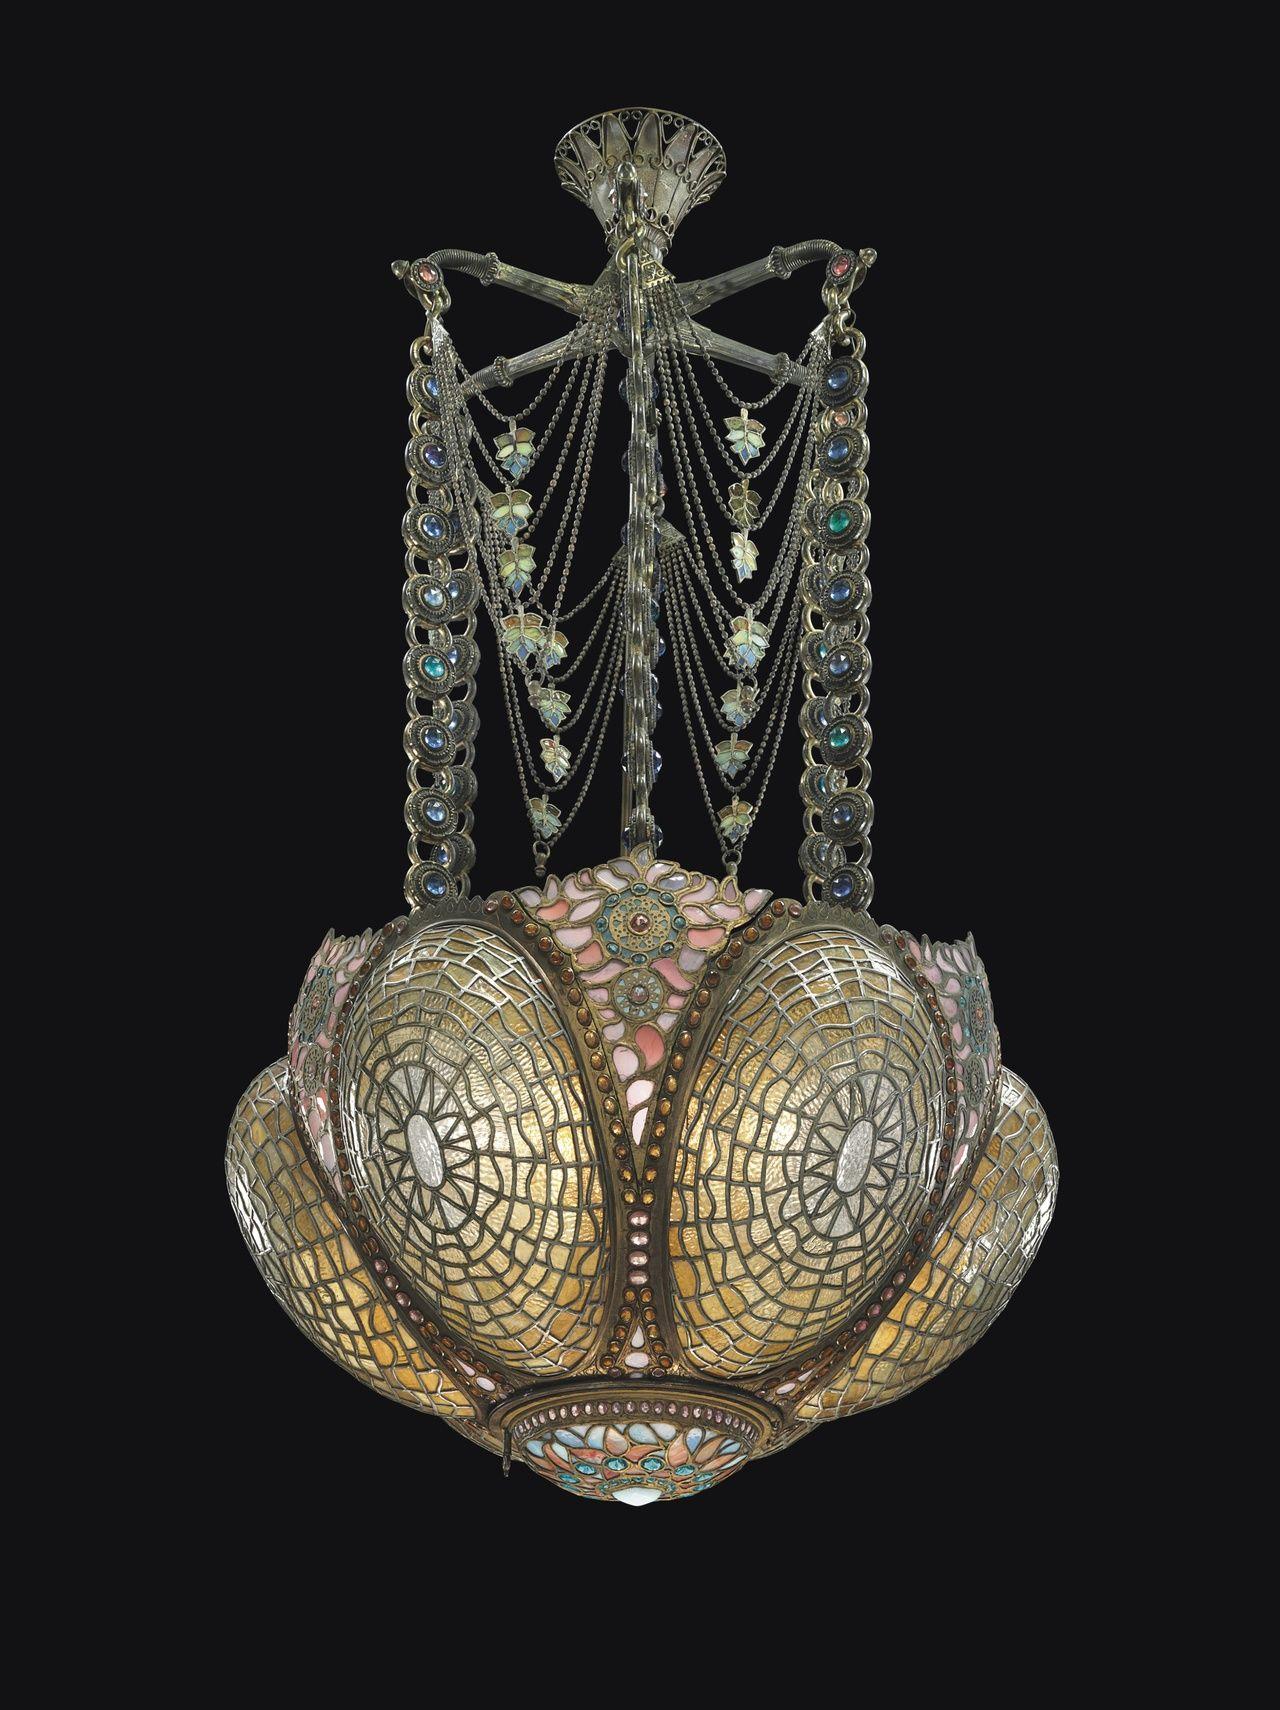 Tiffany Studios Rare and Early Chandelier, Circa 1895